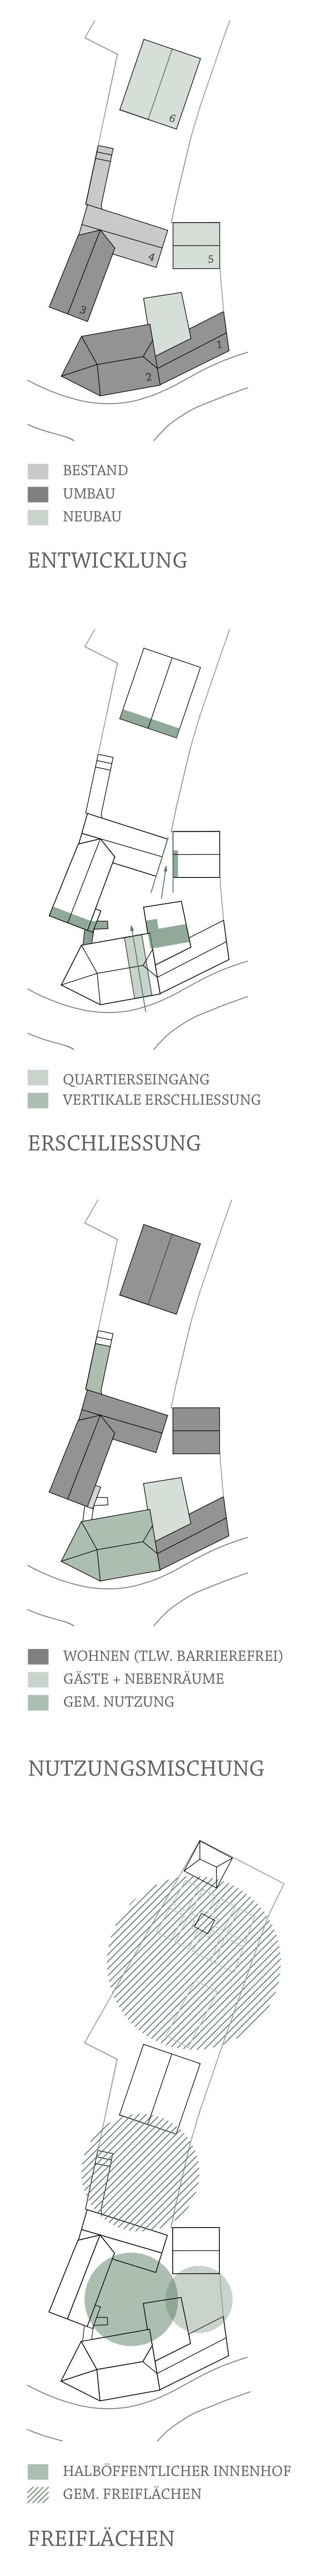 KERCHER_Architetkur_Finklerhof_Konzept.jpg